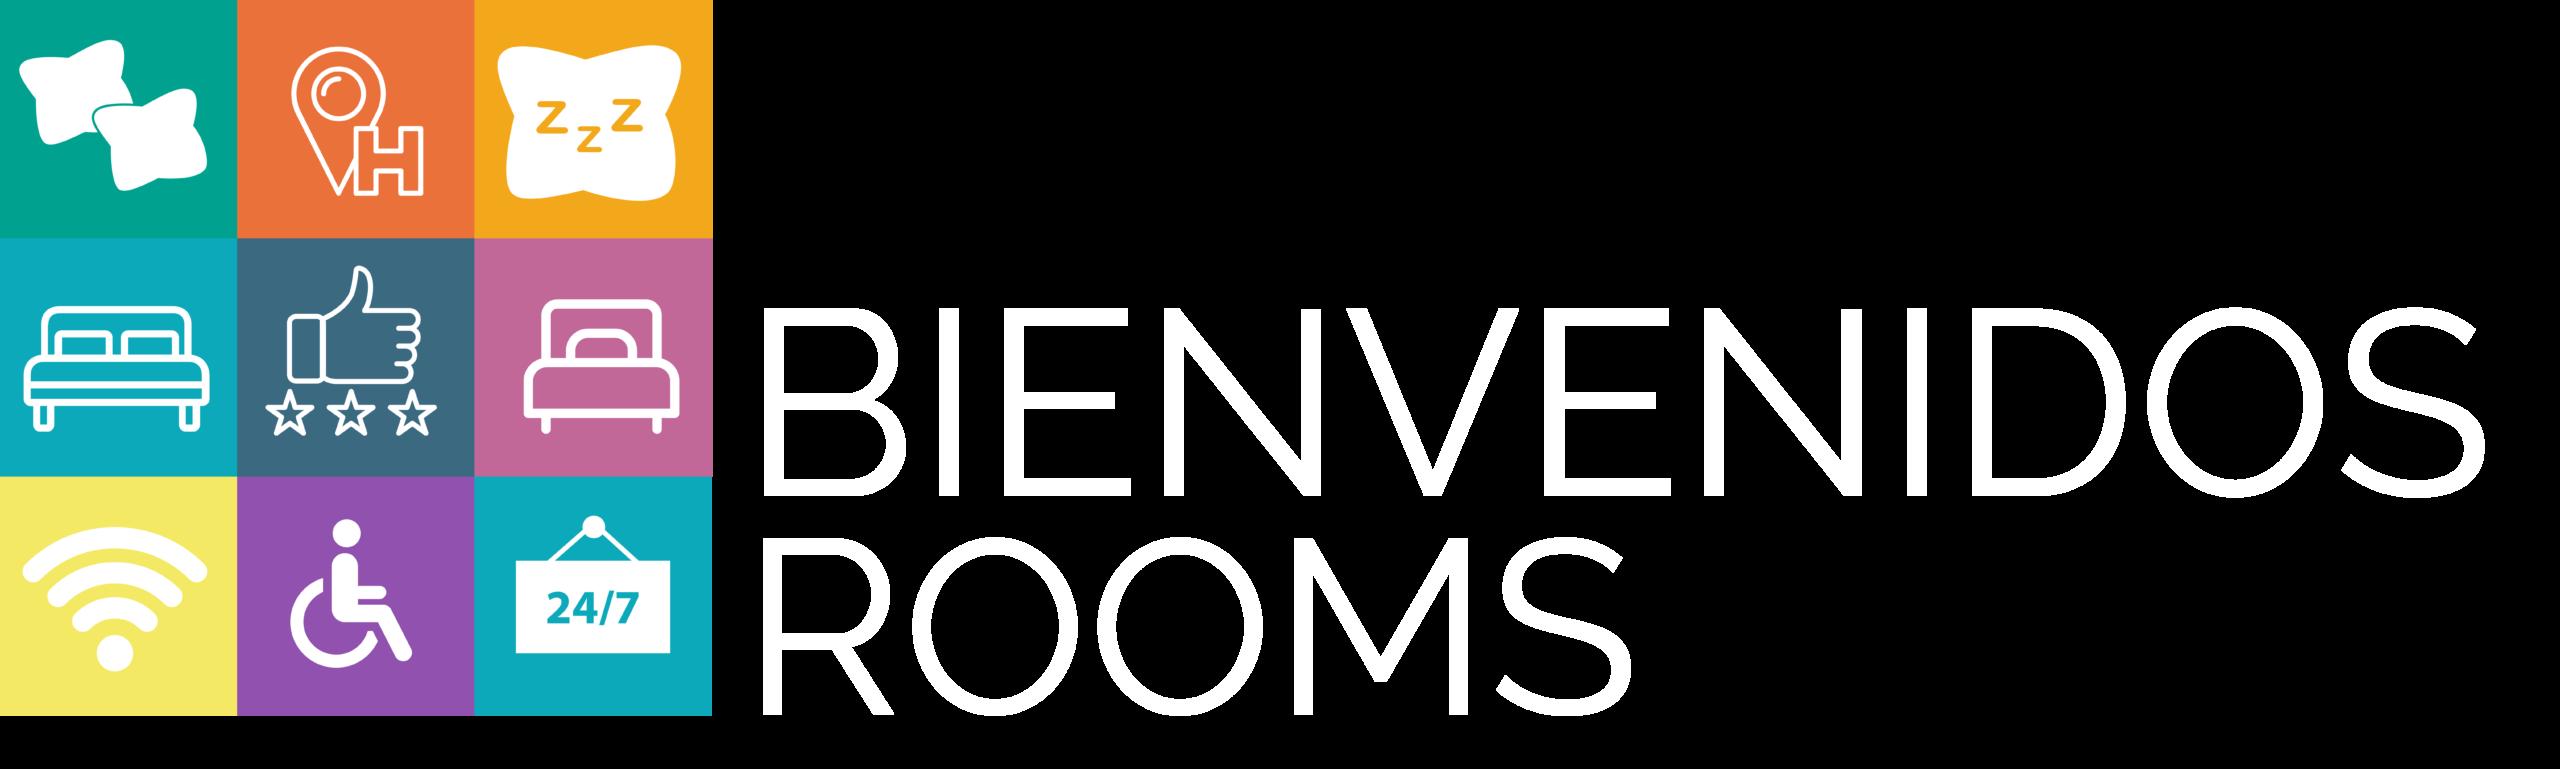 Bienvenidosrooms